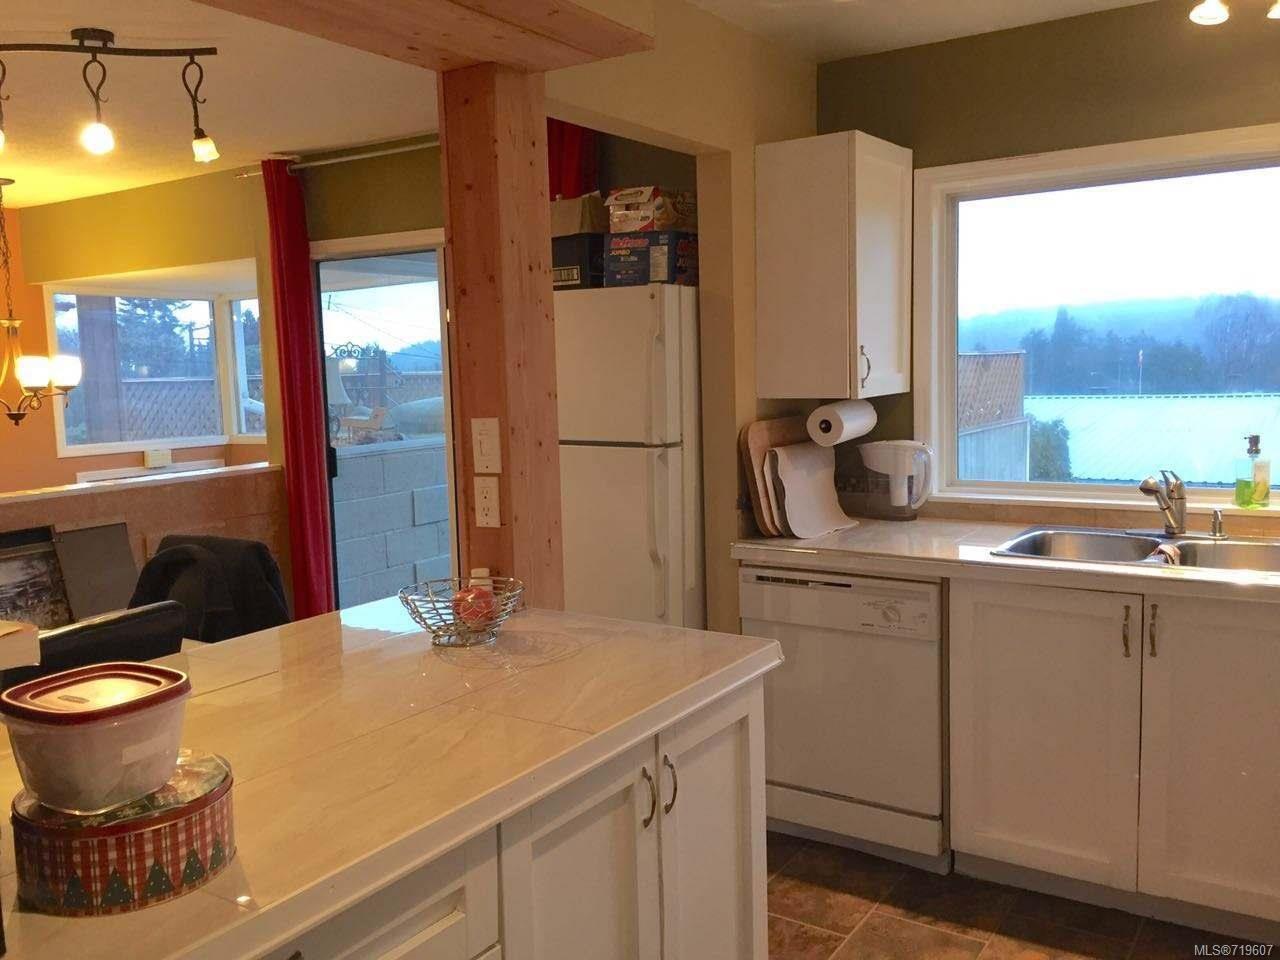 Photo 6: Photos: 935 Beach Dr in NANAIMO: Na Departure Bay House for sale (Nanaimo)  : MLS®# 719607